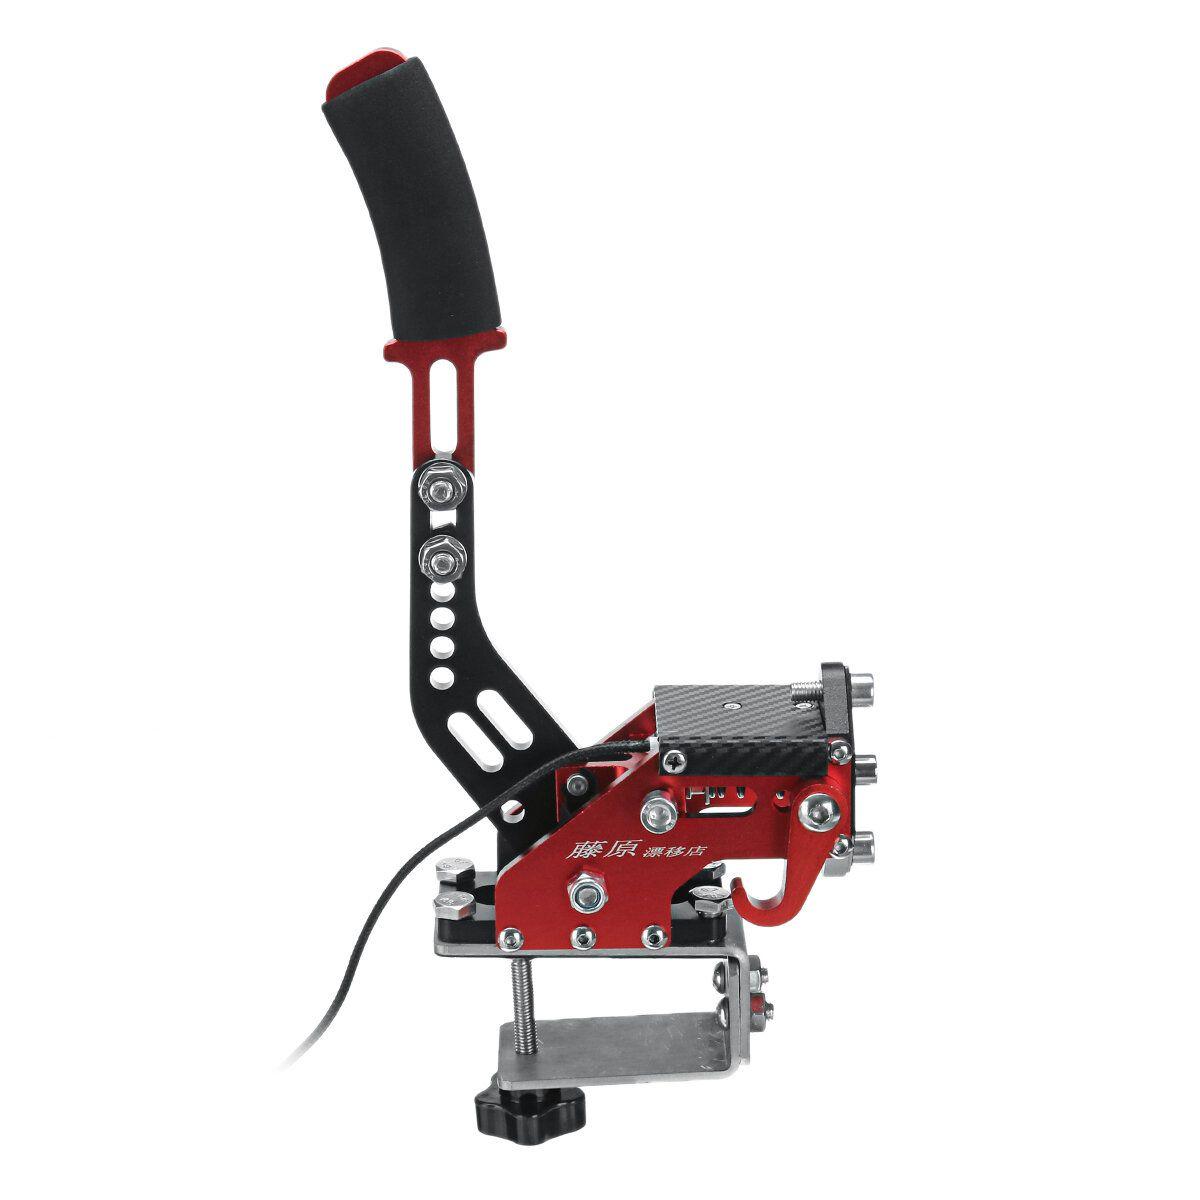 14Bit PC Hall Sensor USB Handbrake Hydraulic Lever SIM With Fixture Clamp For Racing Games G25/27/29 T500 FANATECOSW DIRT